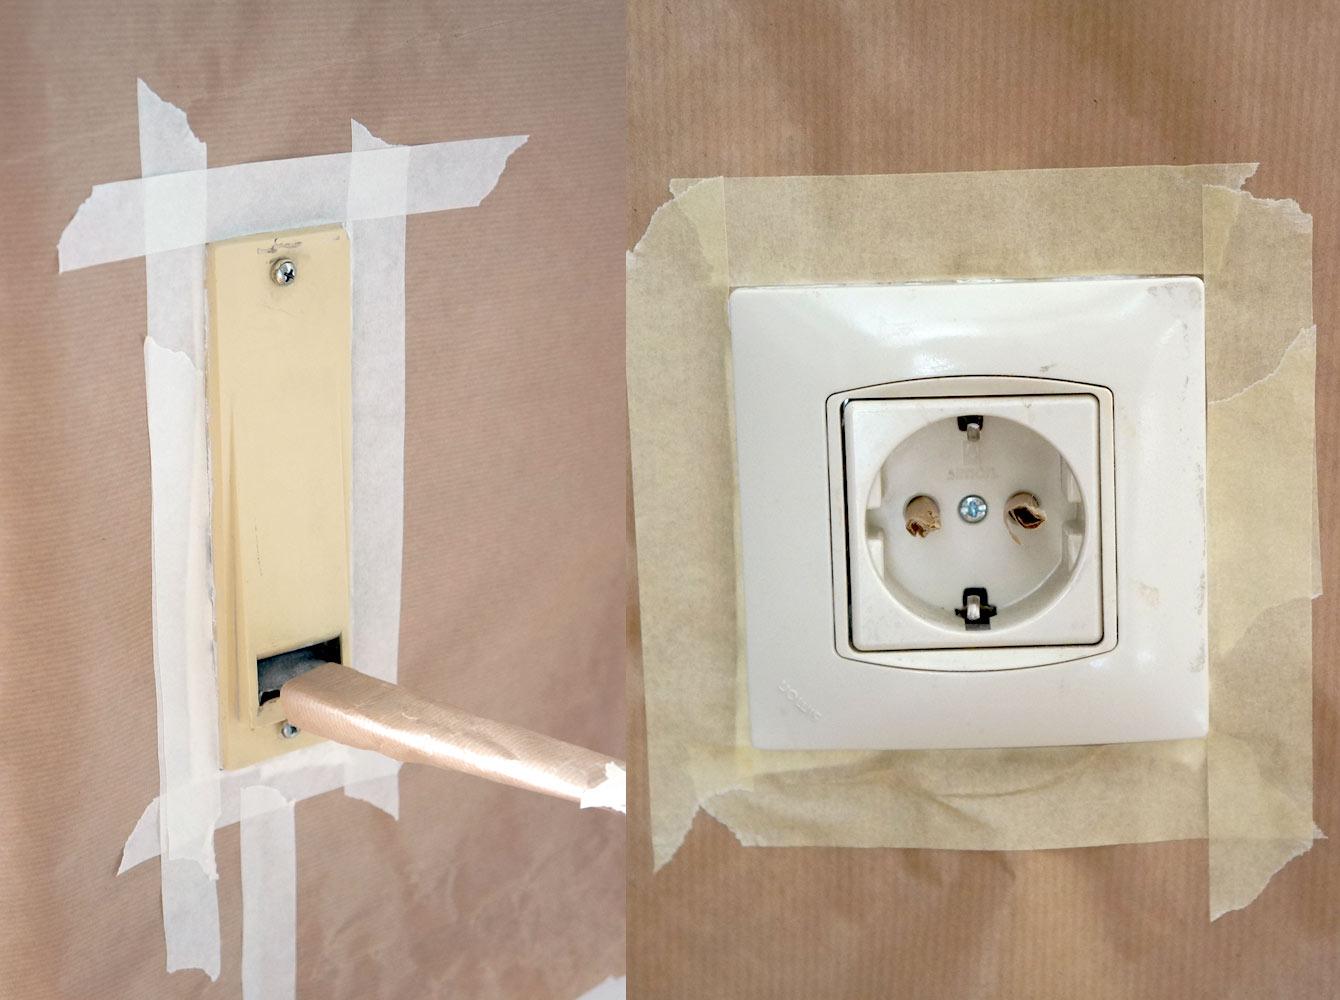 C mo pintar los enchufes e interruptores blog decoraci n - Enchufes e interruptores ...